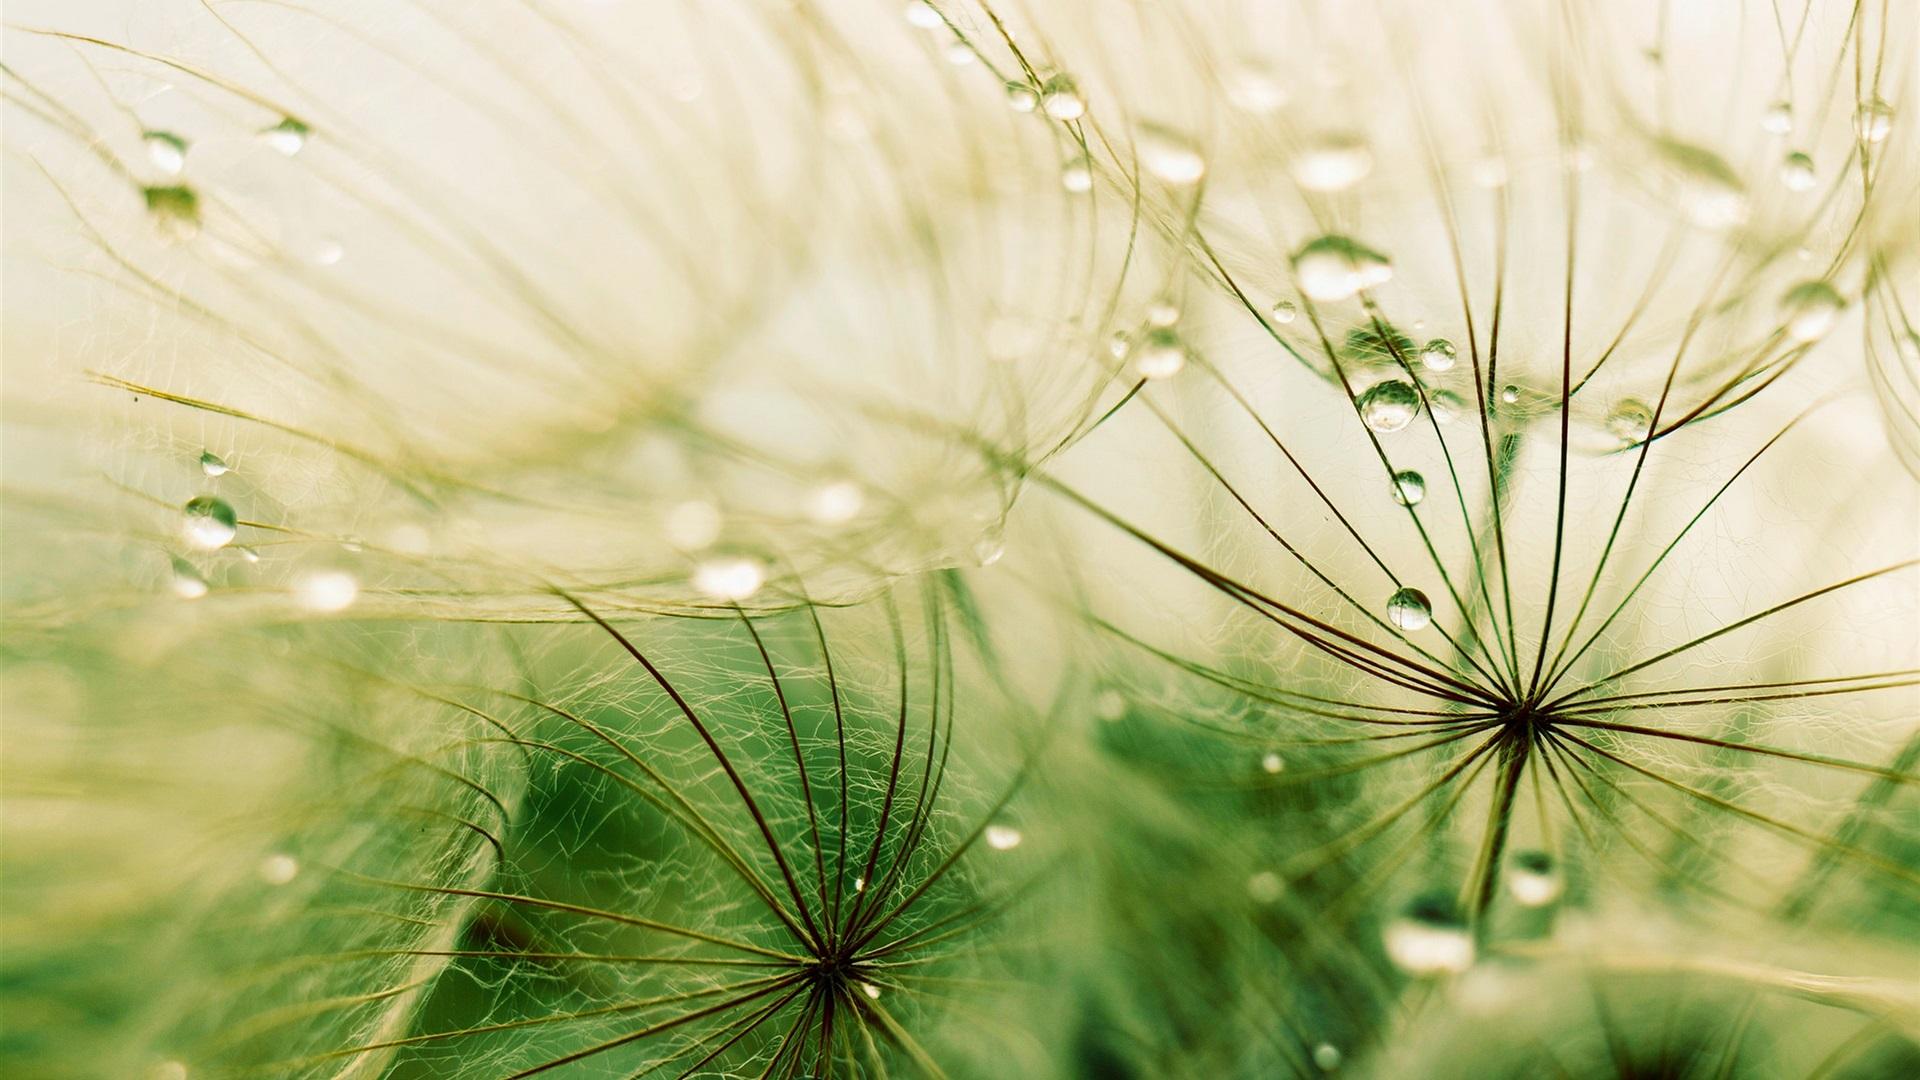 grass macro photography - photo #29